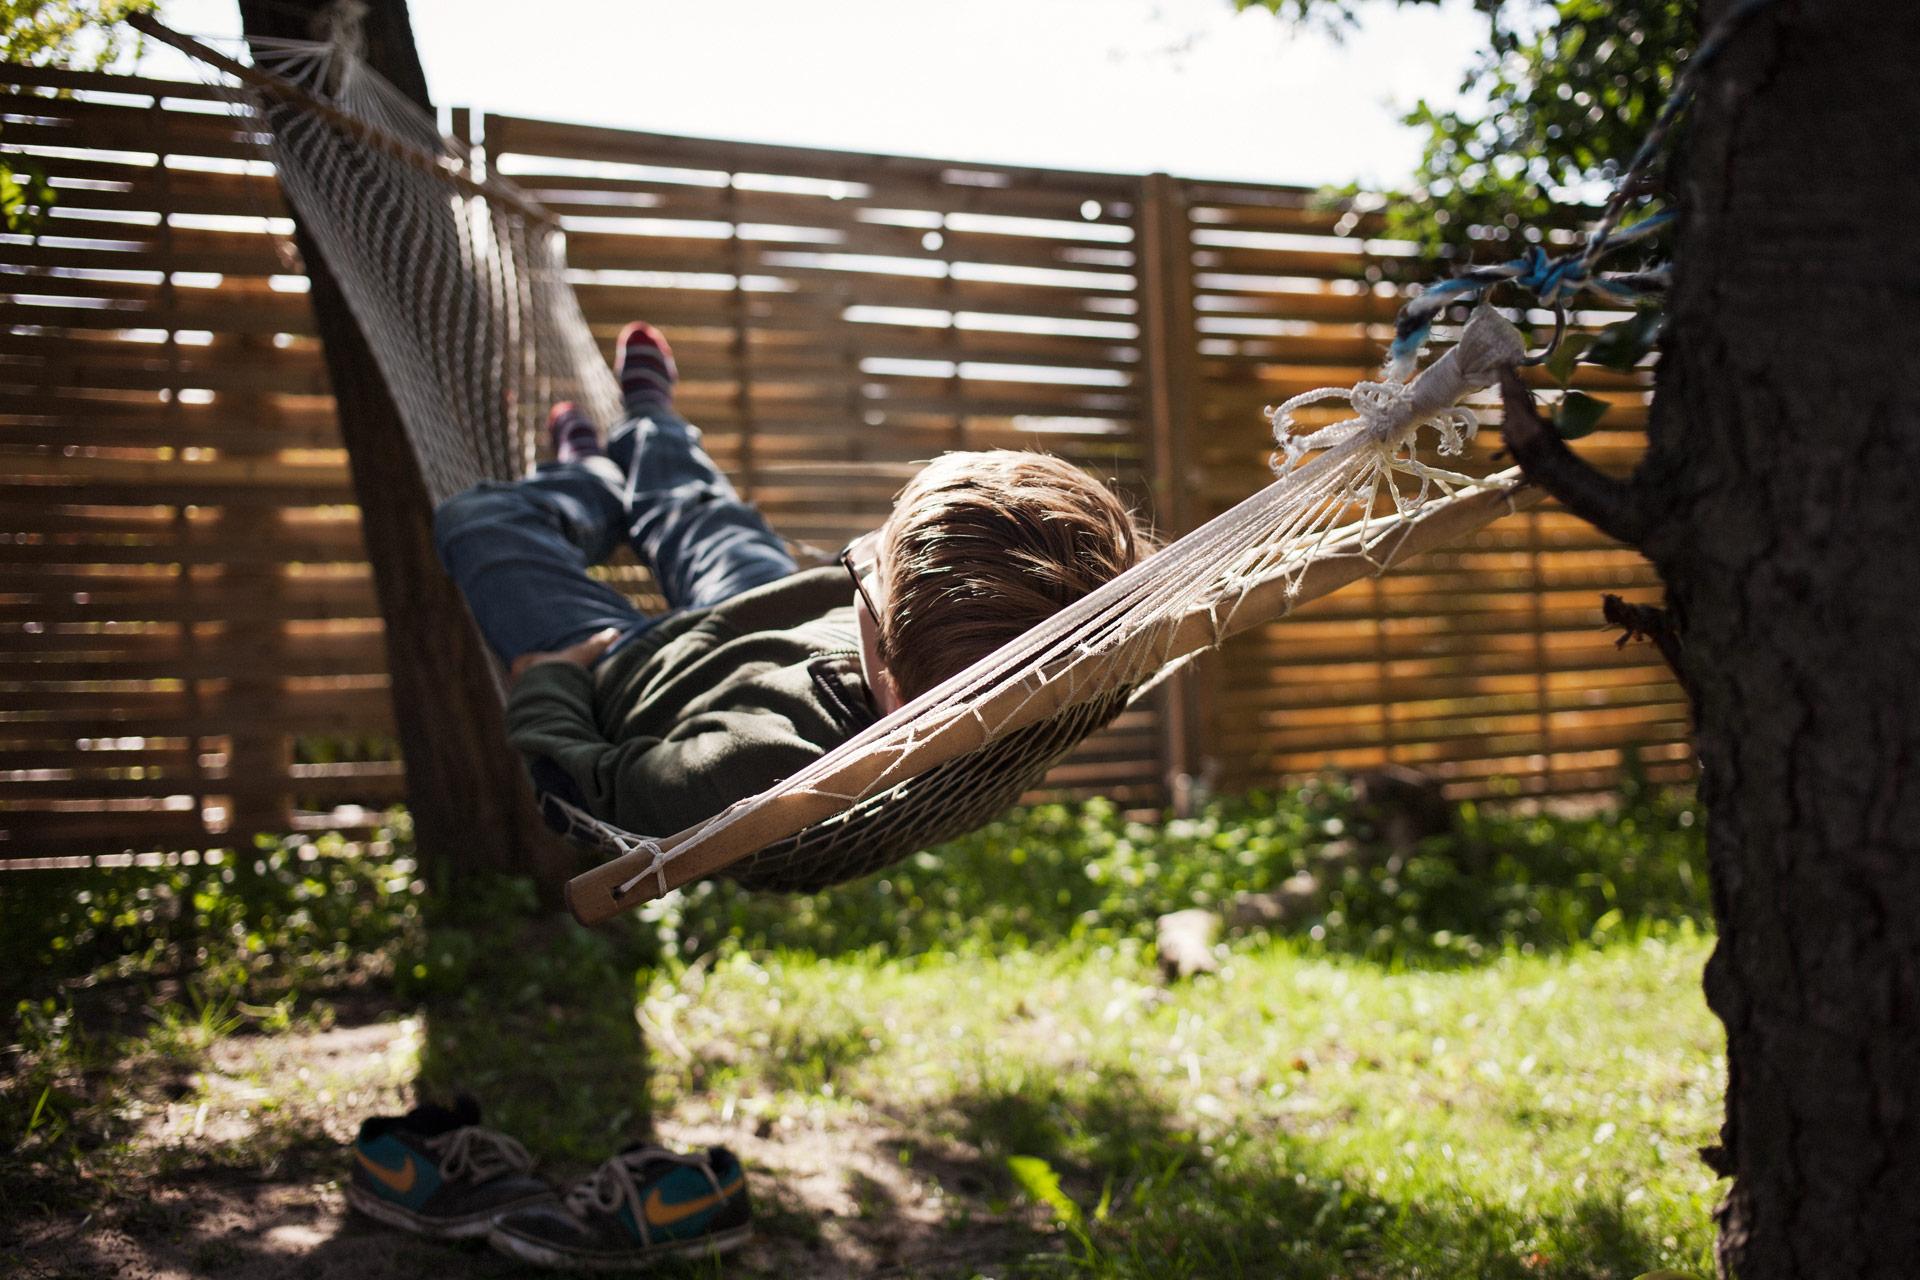 timo-stammberger-photography-fotografie-hammock-harmony-boy-relaxing-sunny-garden